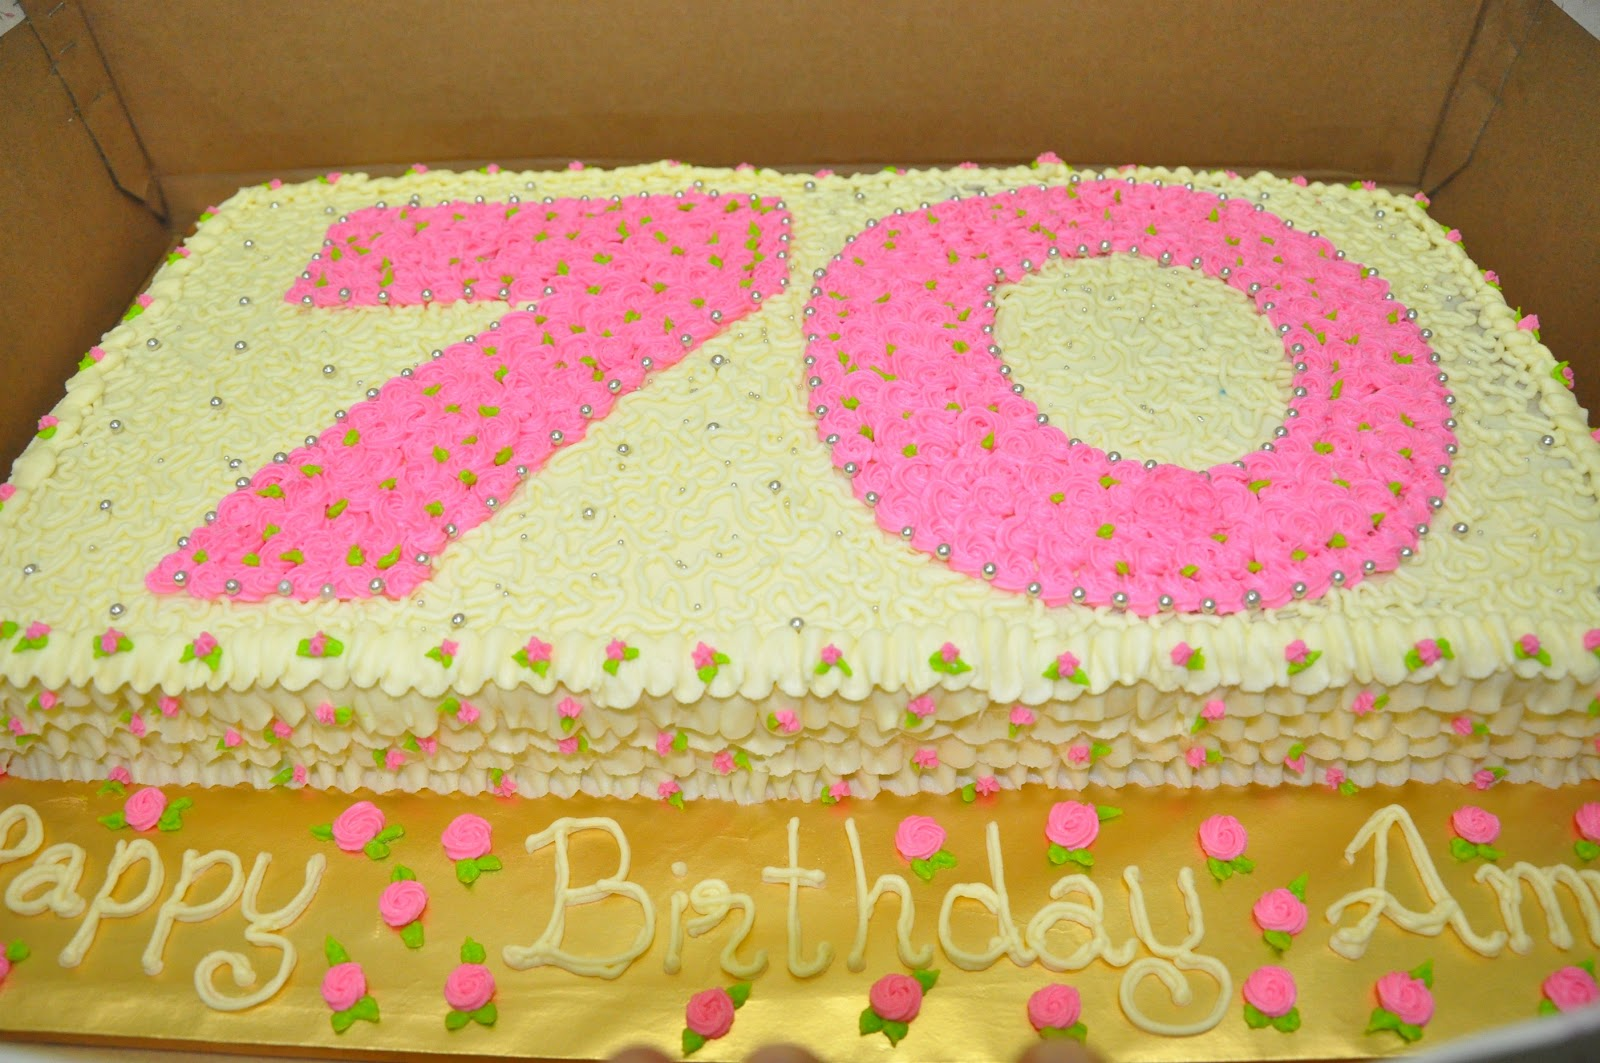 Applemint Cake Shop Ipoh 70th Birthday For Mum